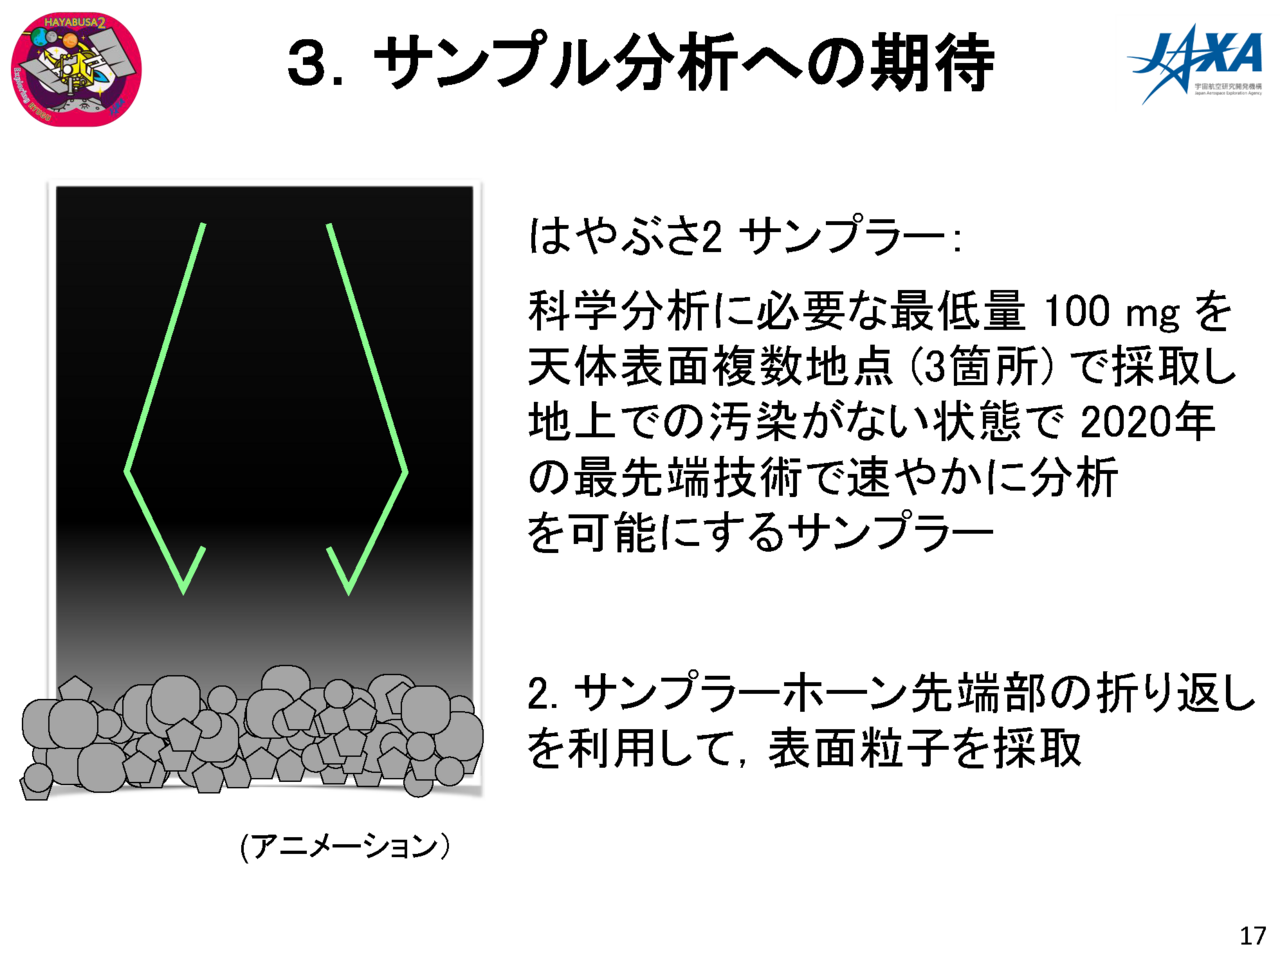 f:id:Imamura:20180719131712p:plain